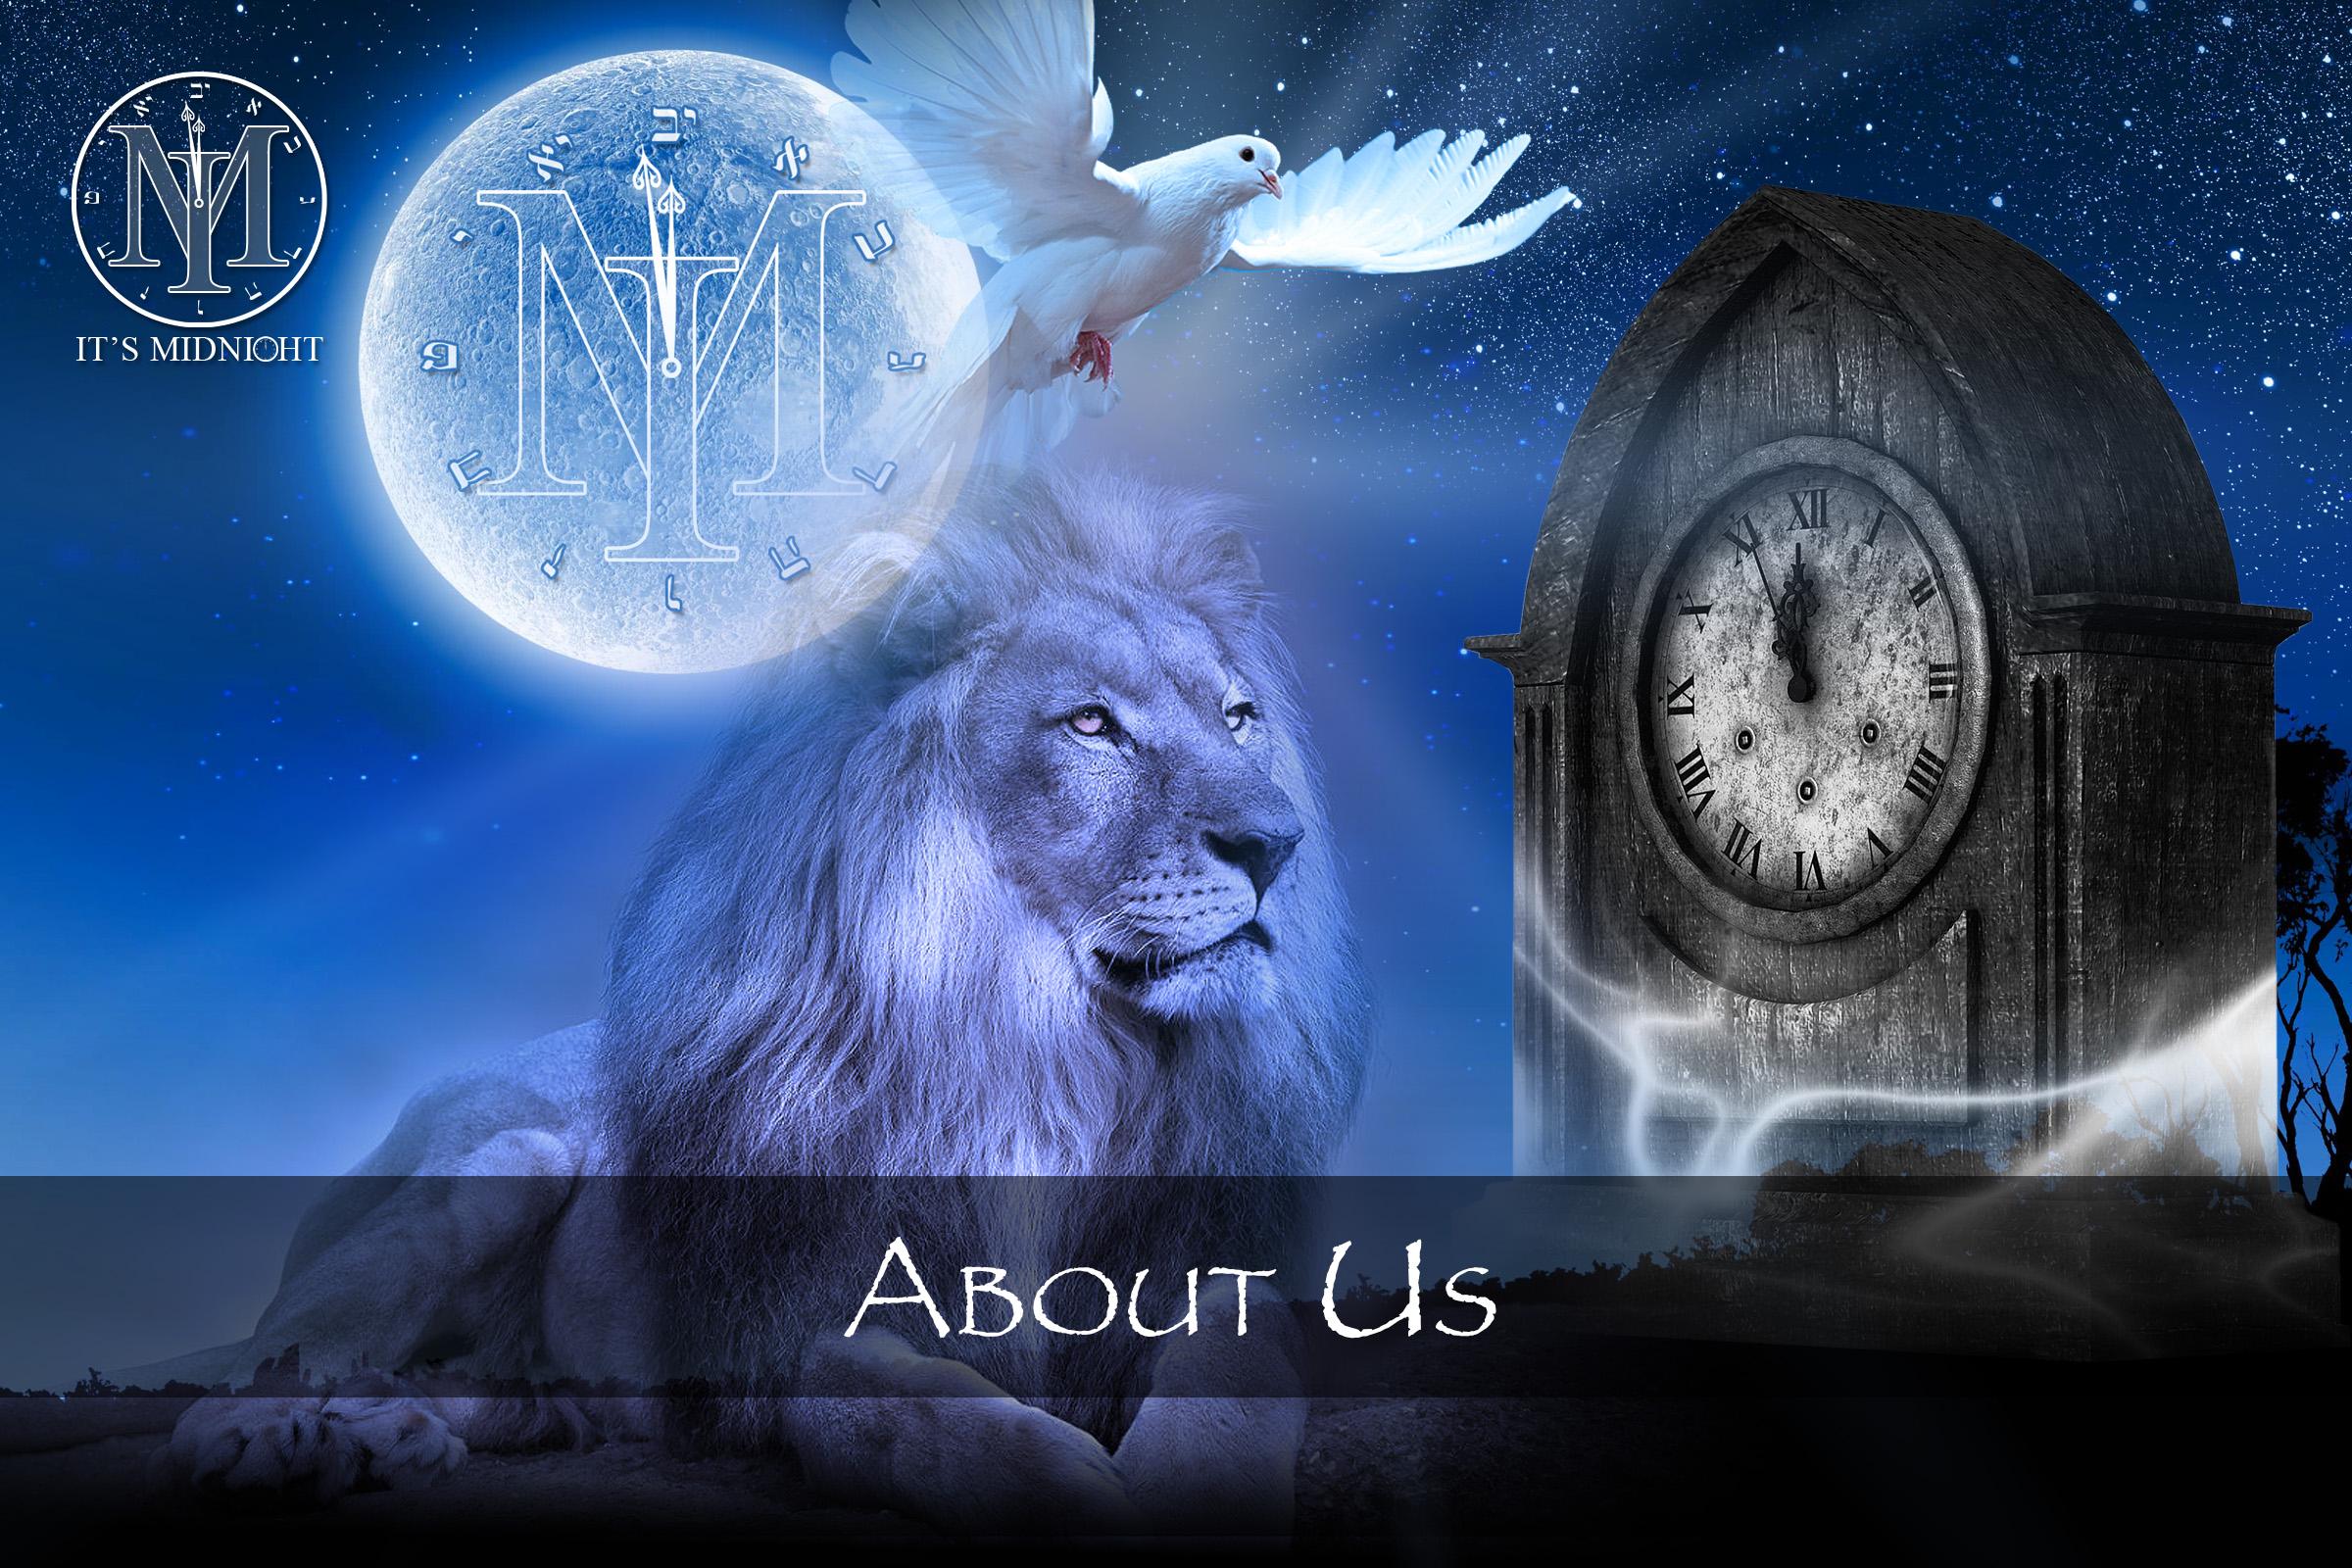 About Us Thumbnail - It's Midnight.jpg